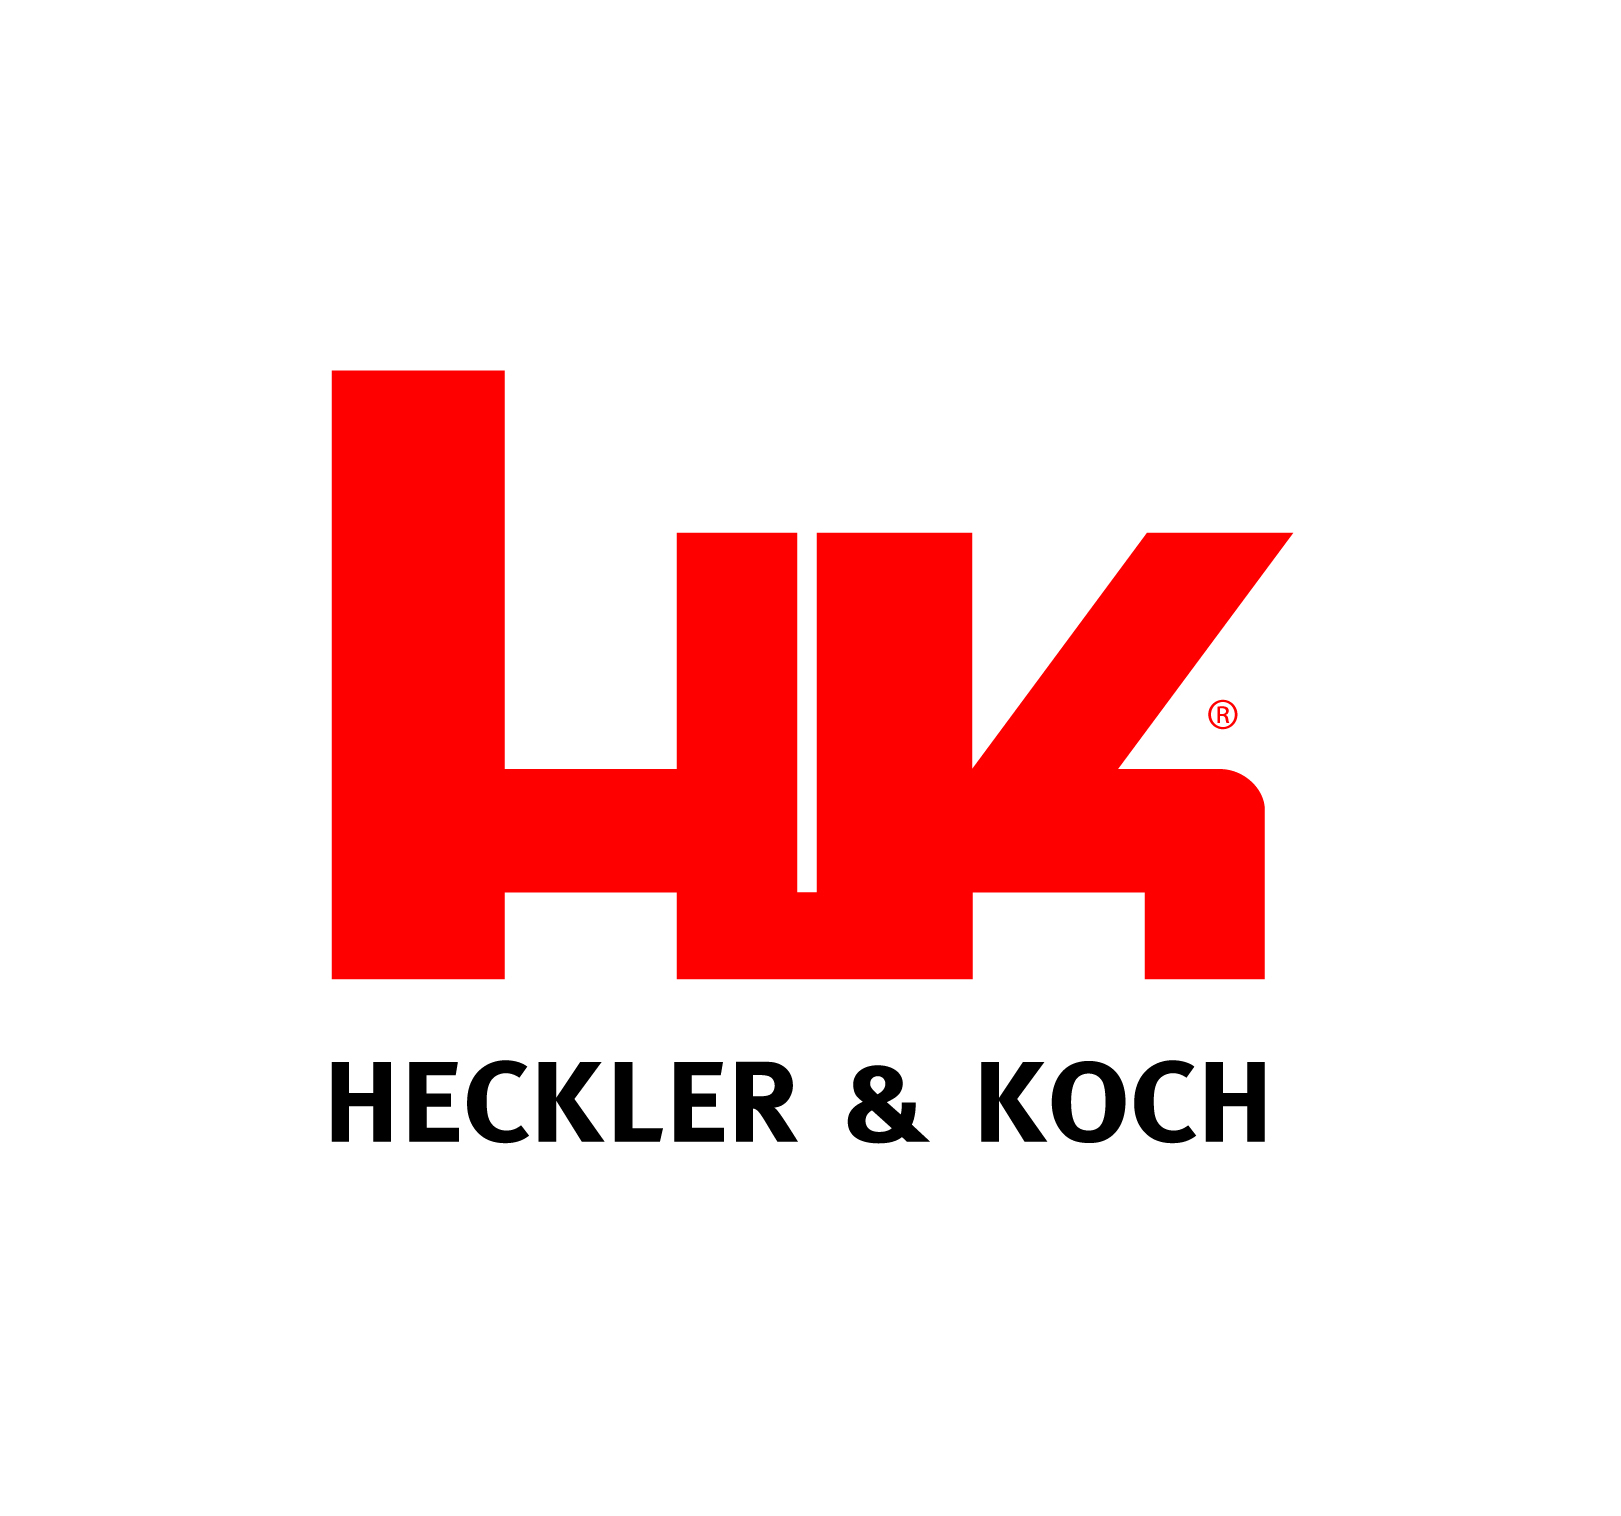 https://www.dtacticalsupply.com/wp-content/uploads/2020/04/Heckler-Koch-Logo-002.jpg